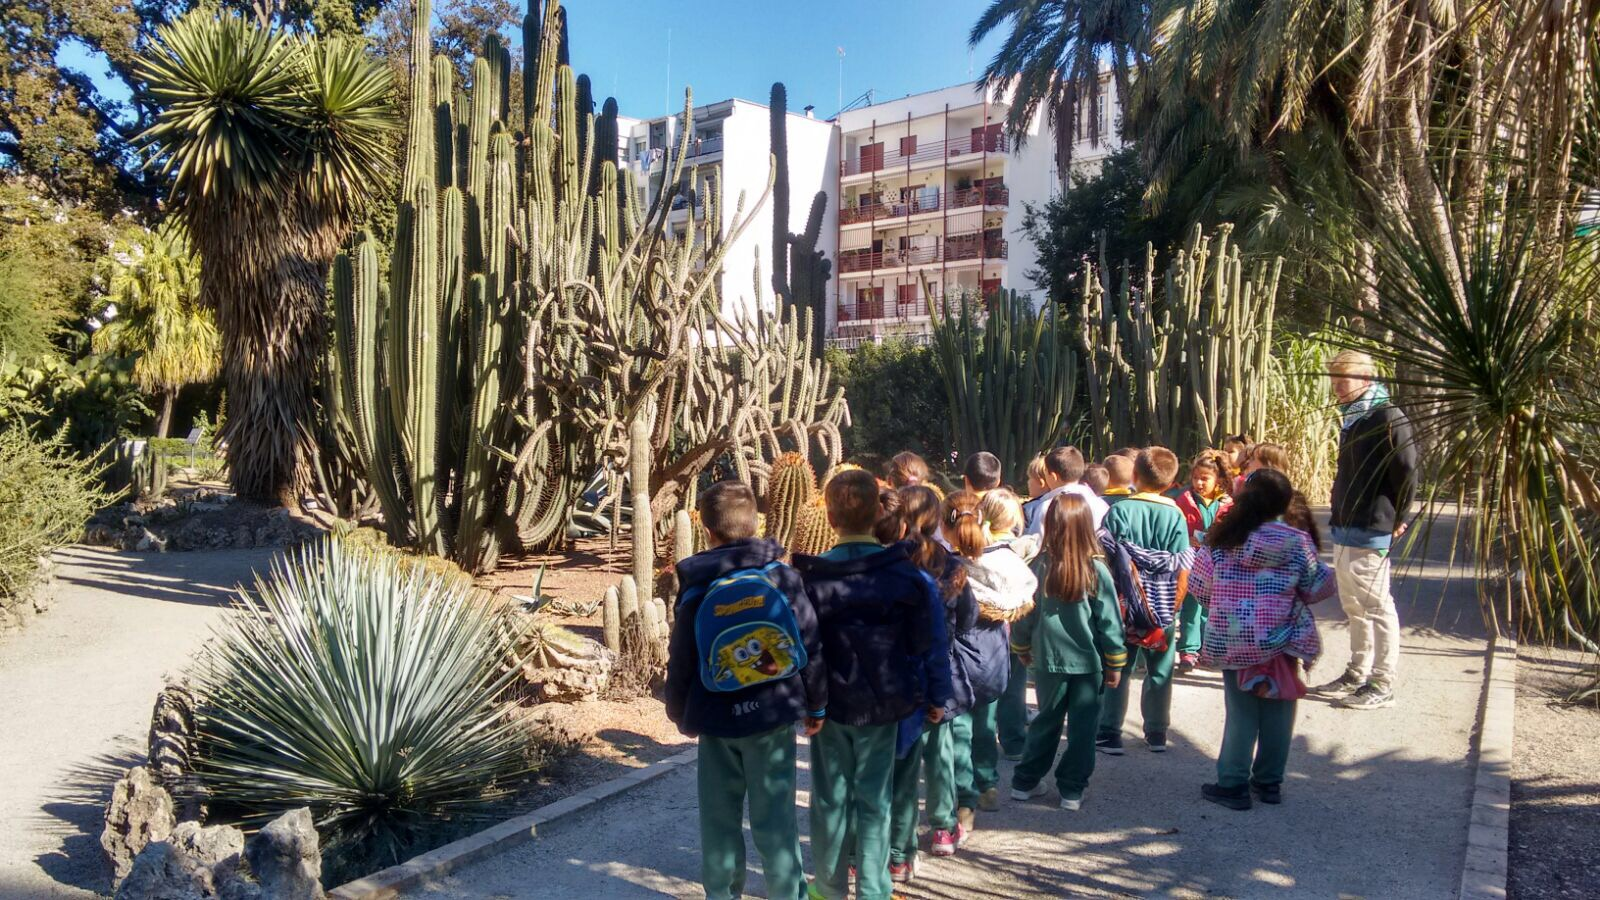 Jard n bot nico colegio concha espina valencia for Talleres jardin botanico